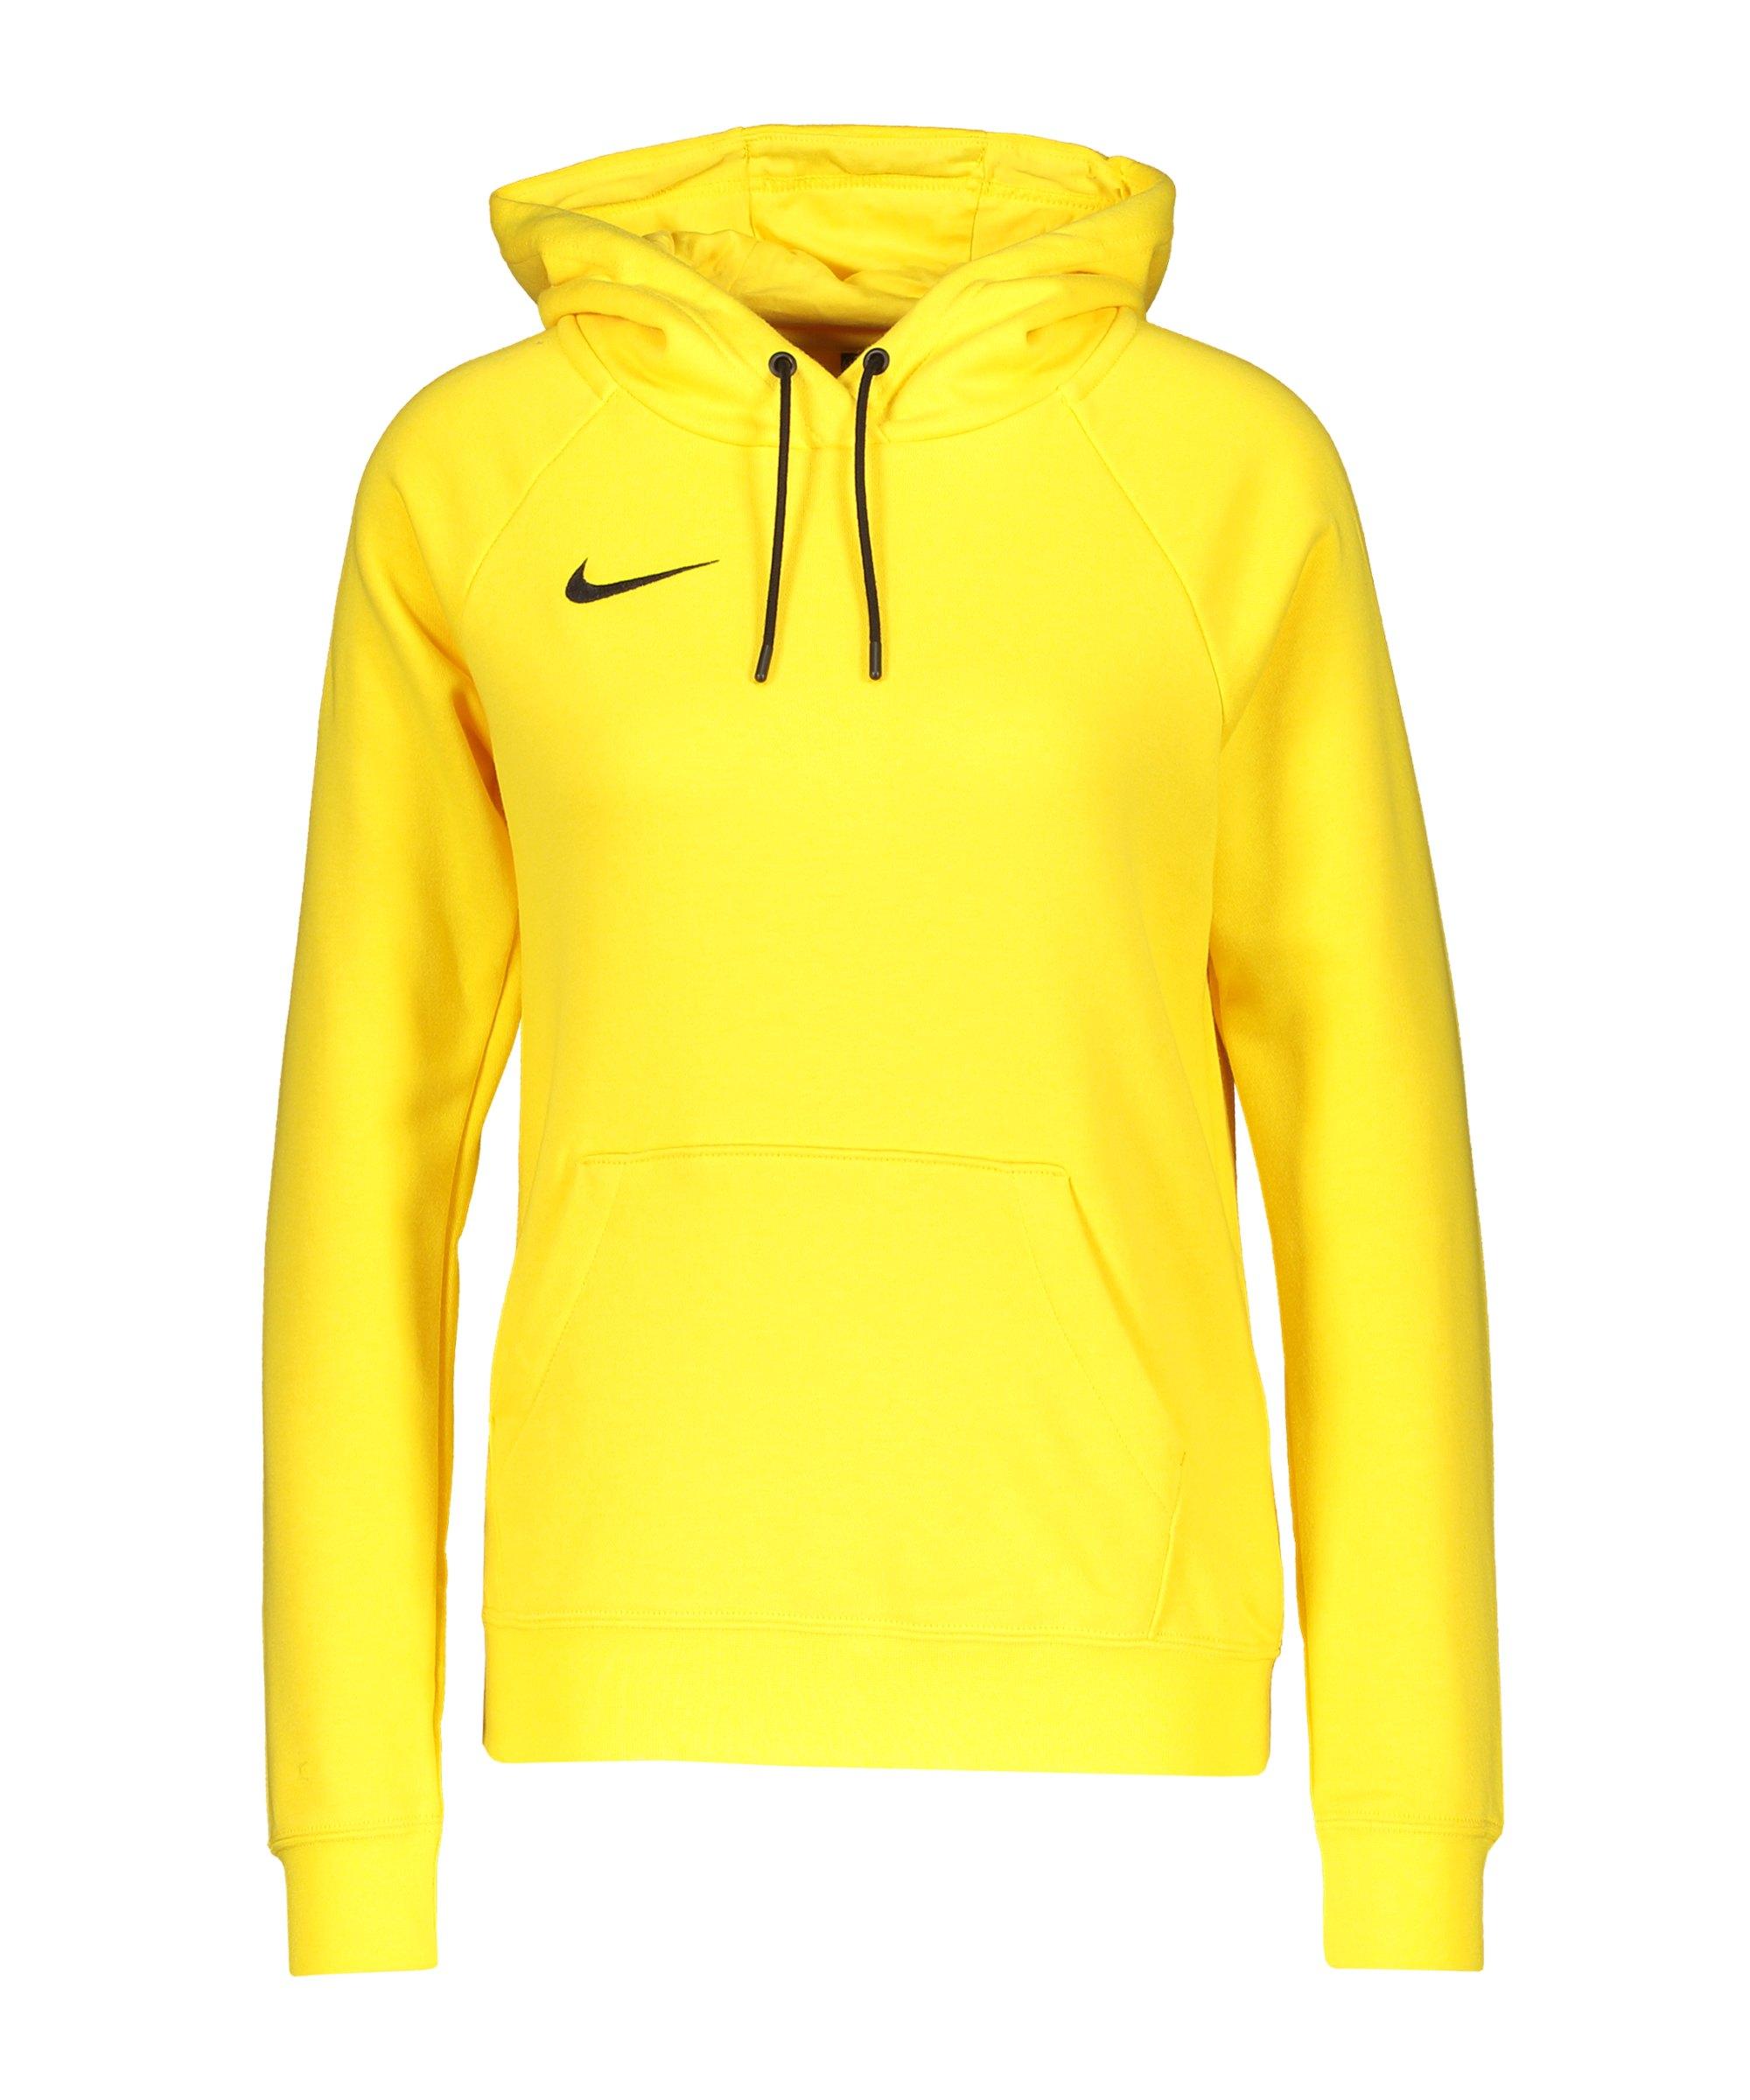 Nike Park 20 Fleece Hoody Damen Gelb Schwarz F719 - gelb